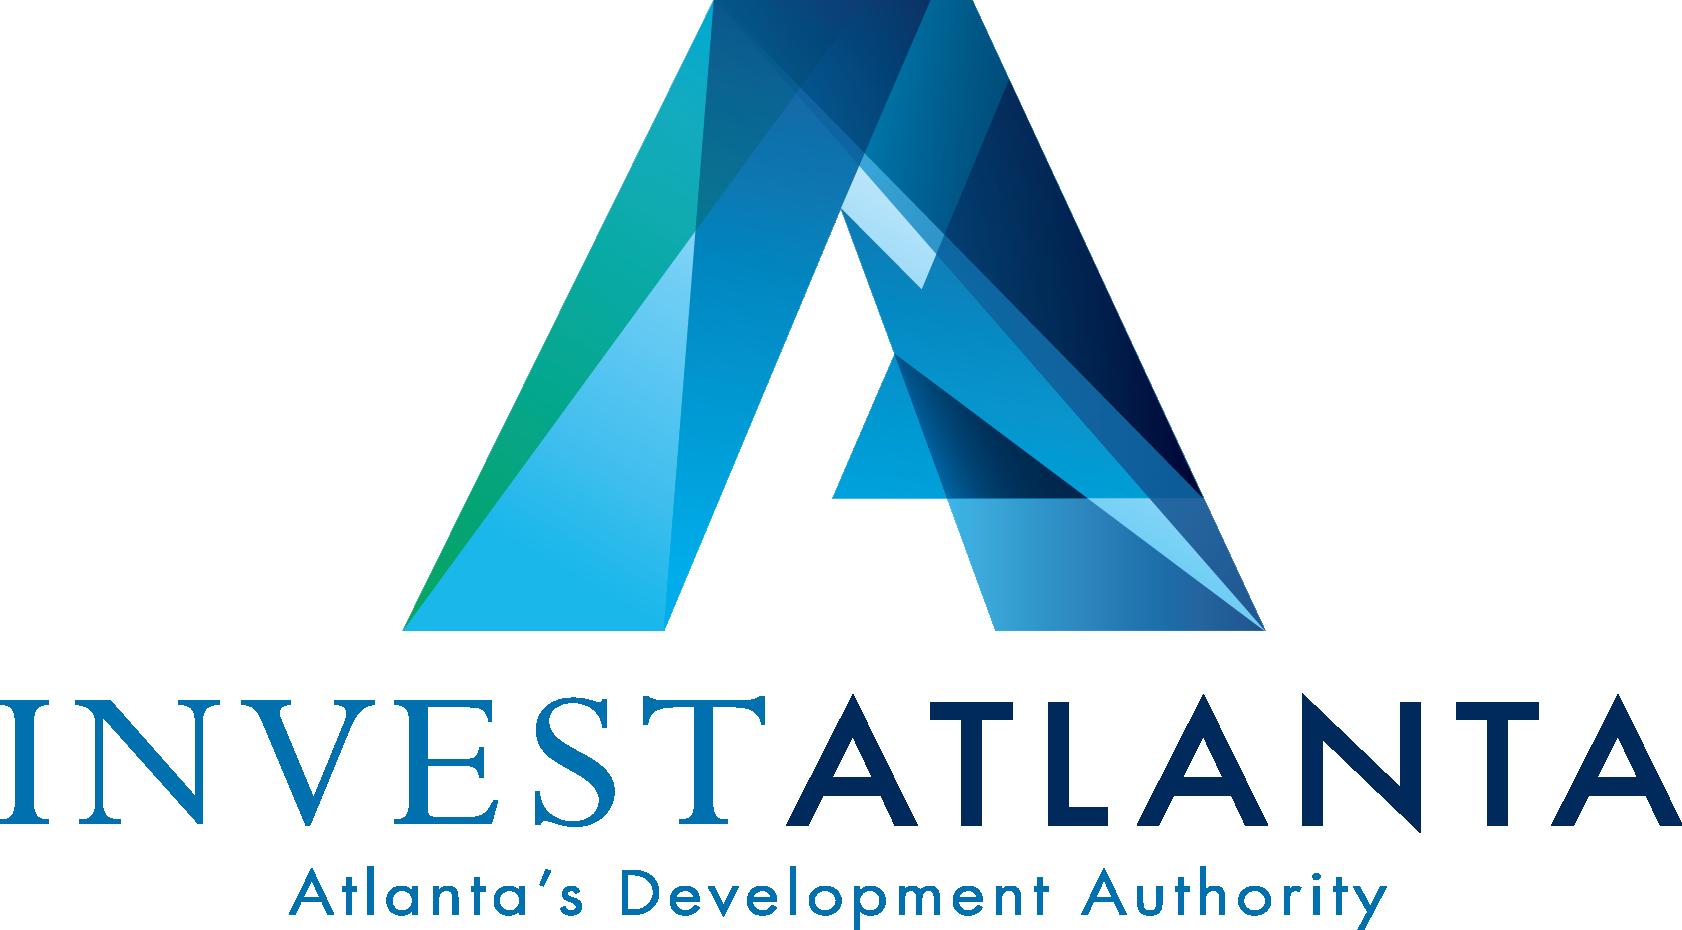 Invest_Atlanta_logo.png